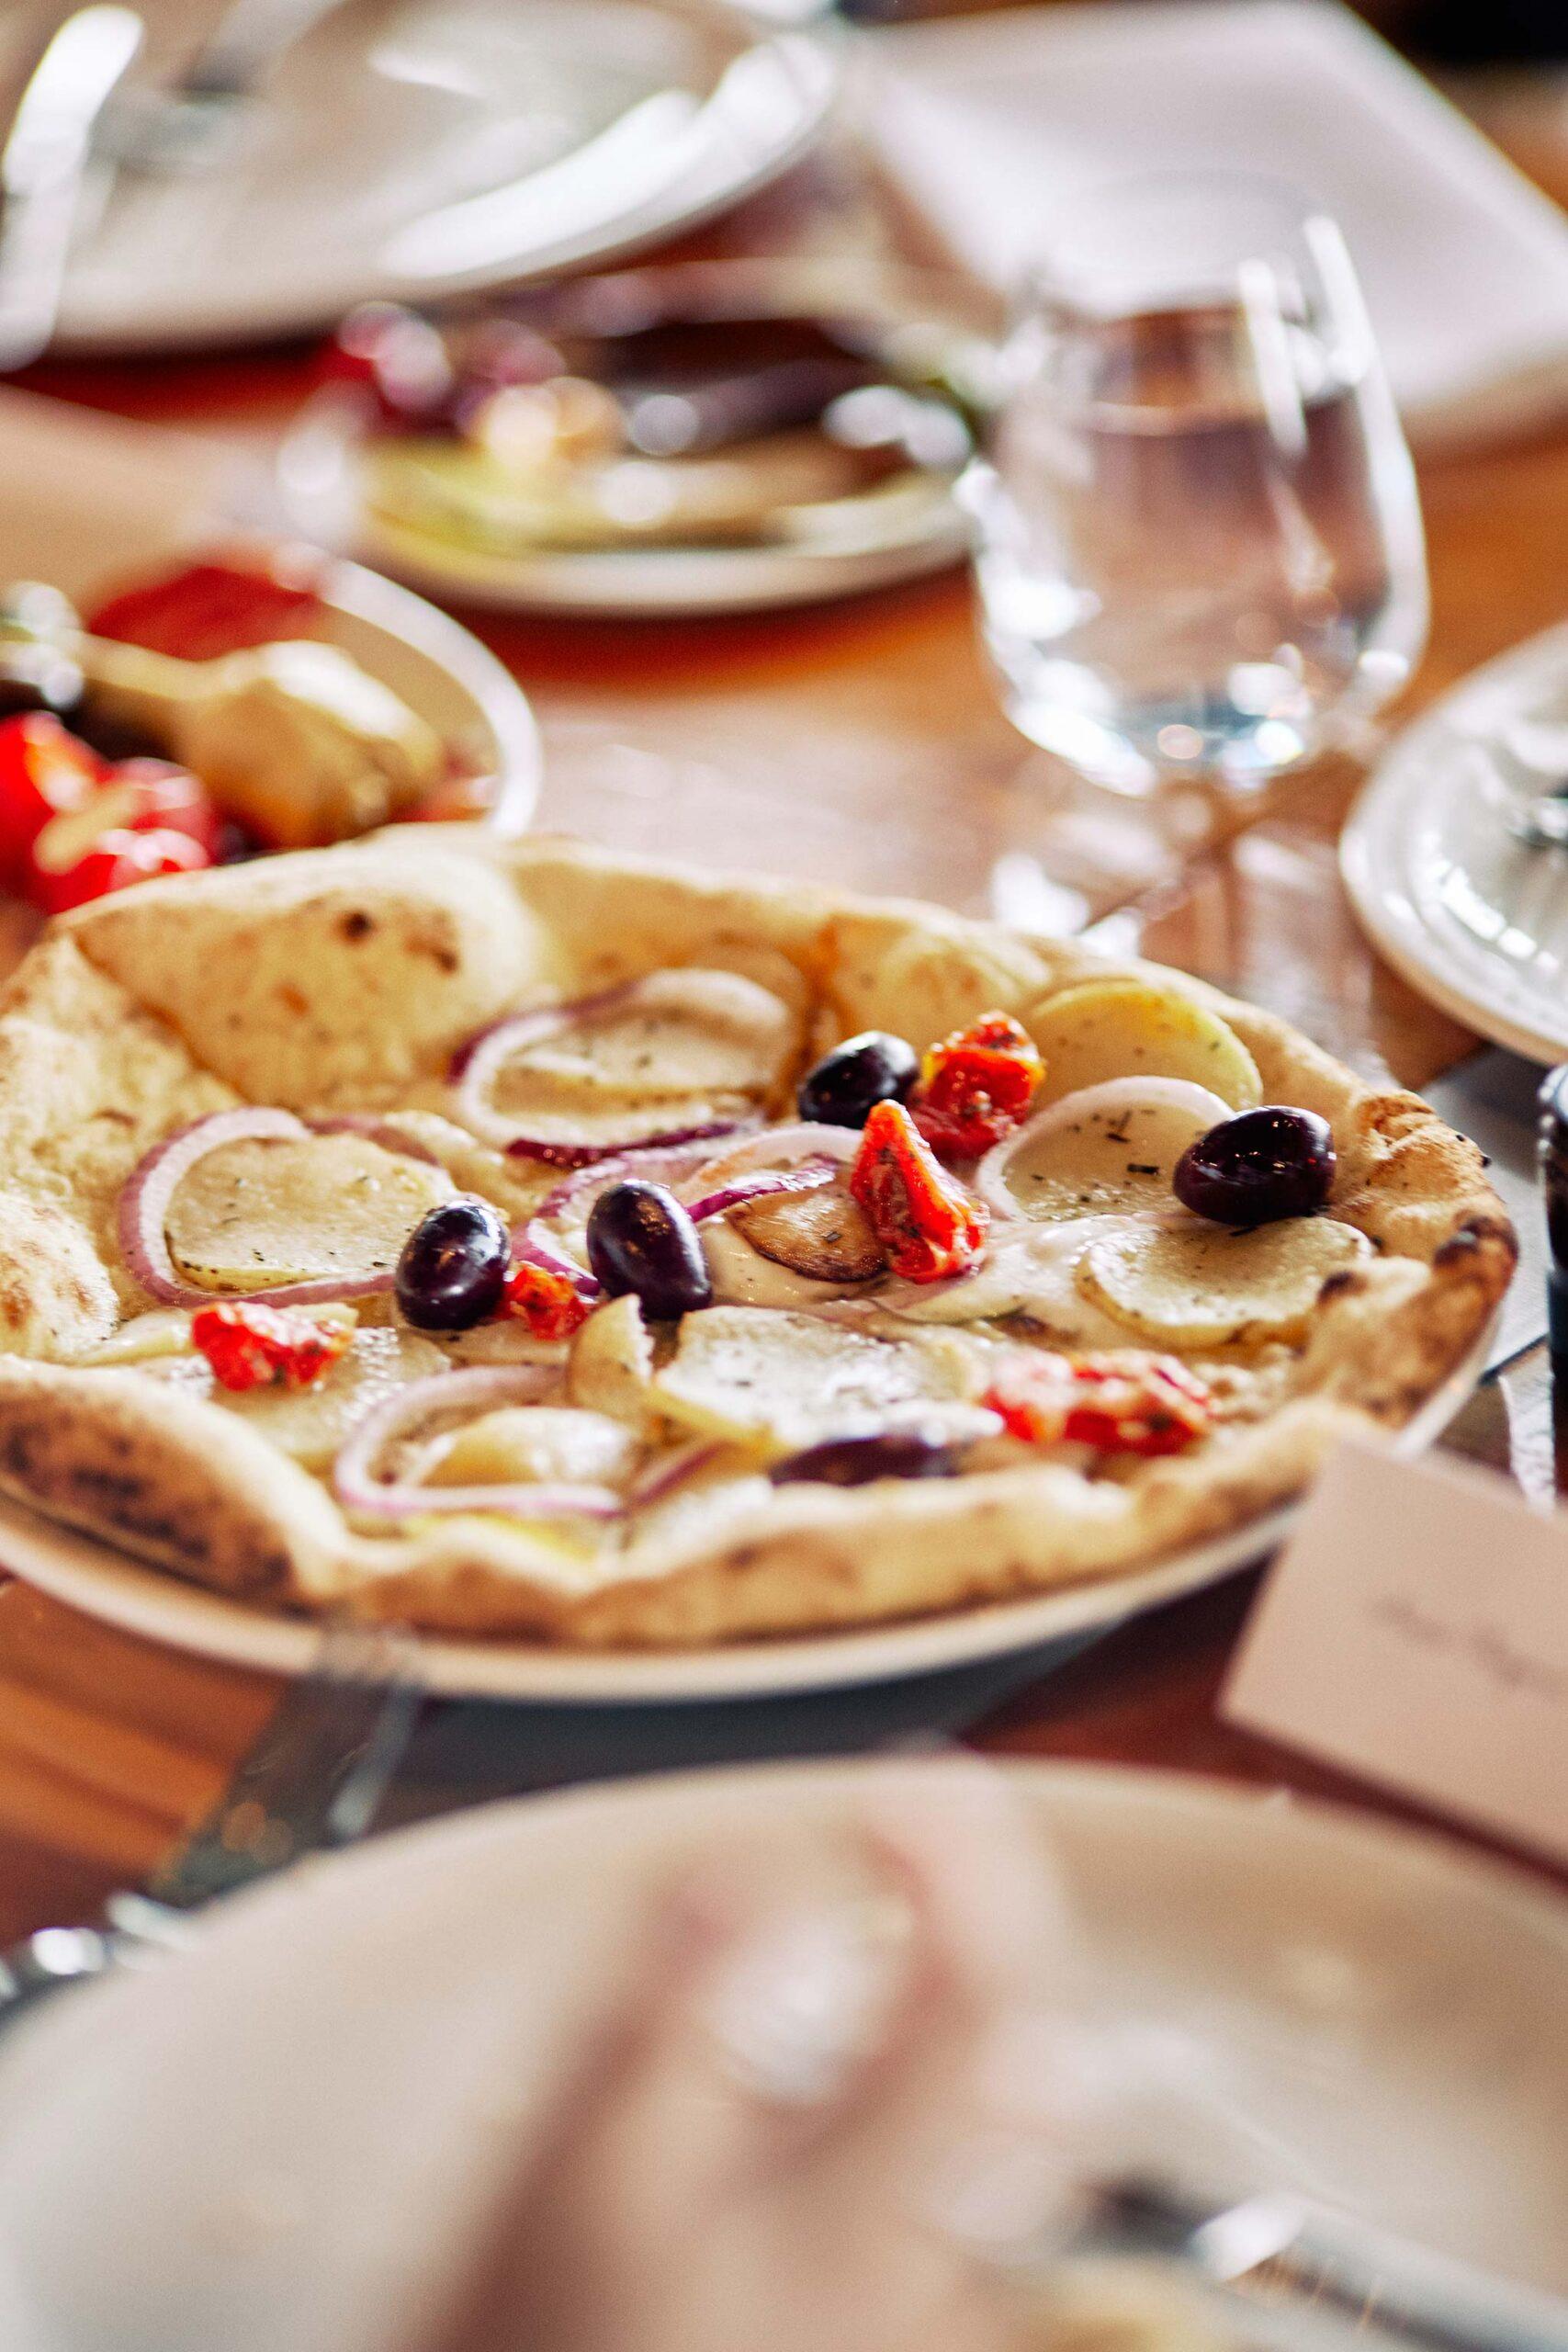 zonzo wedding photography entree reception pizza olive